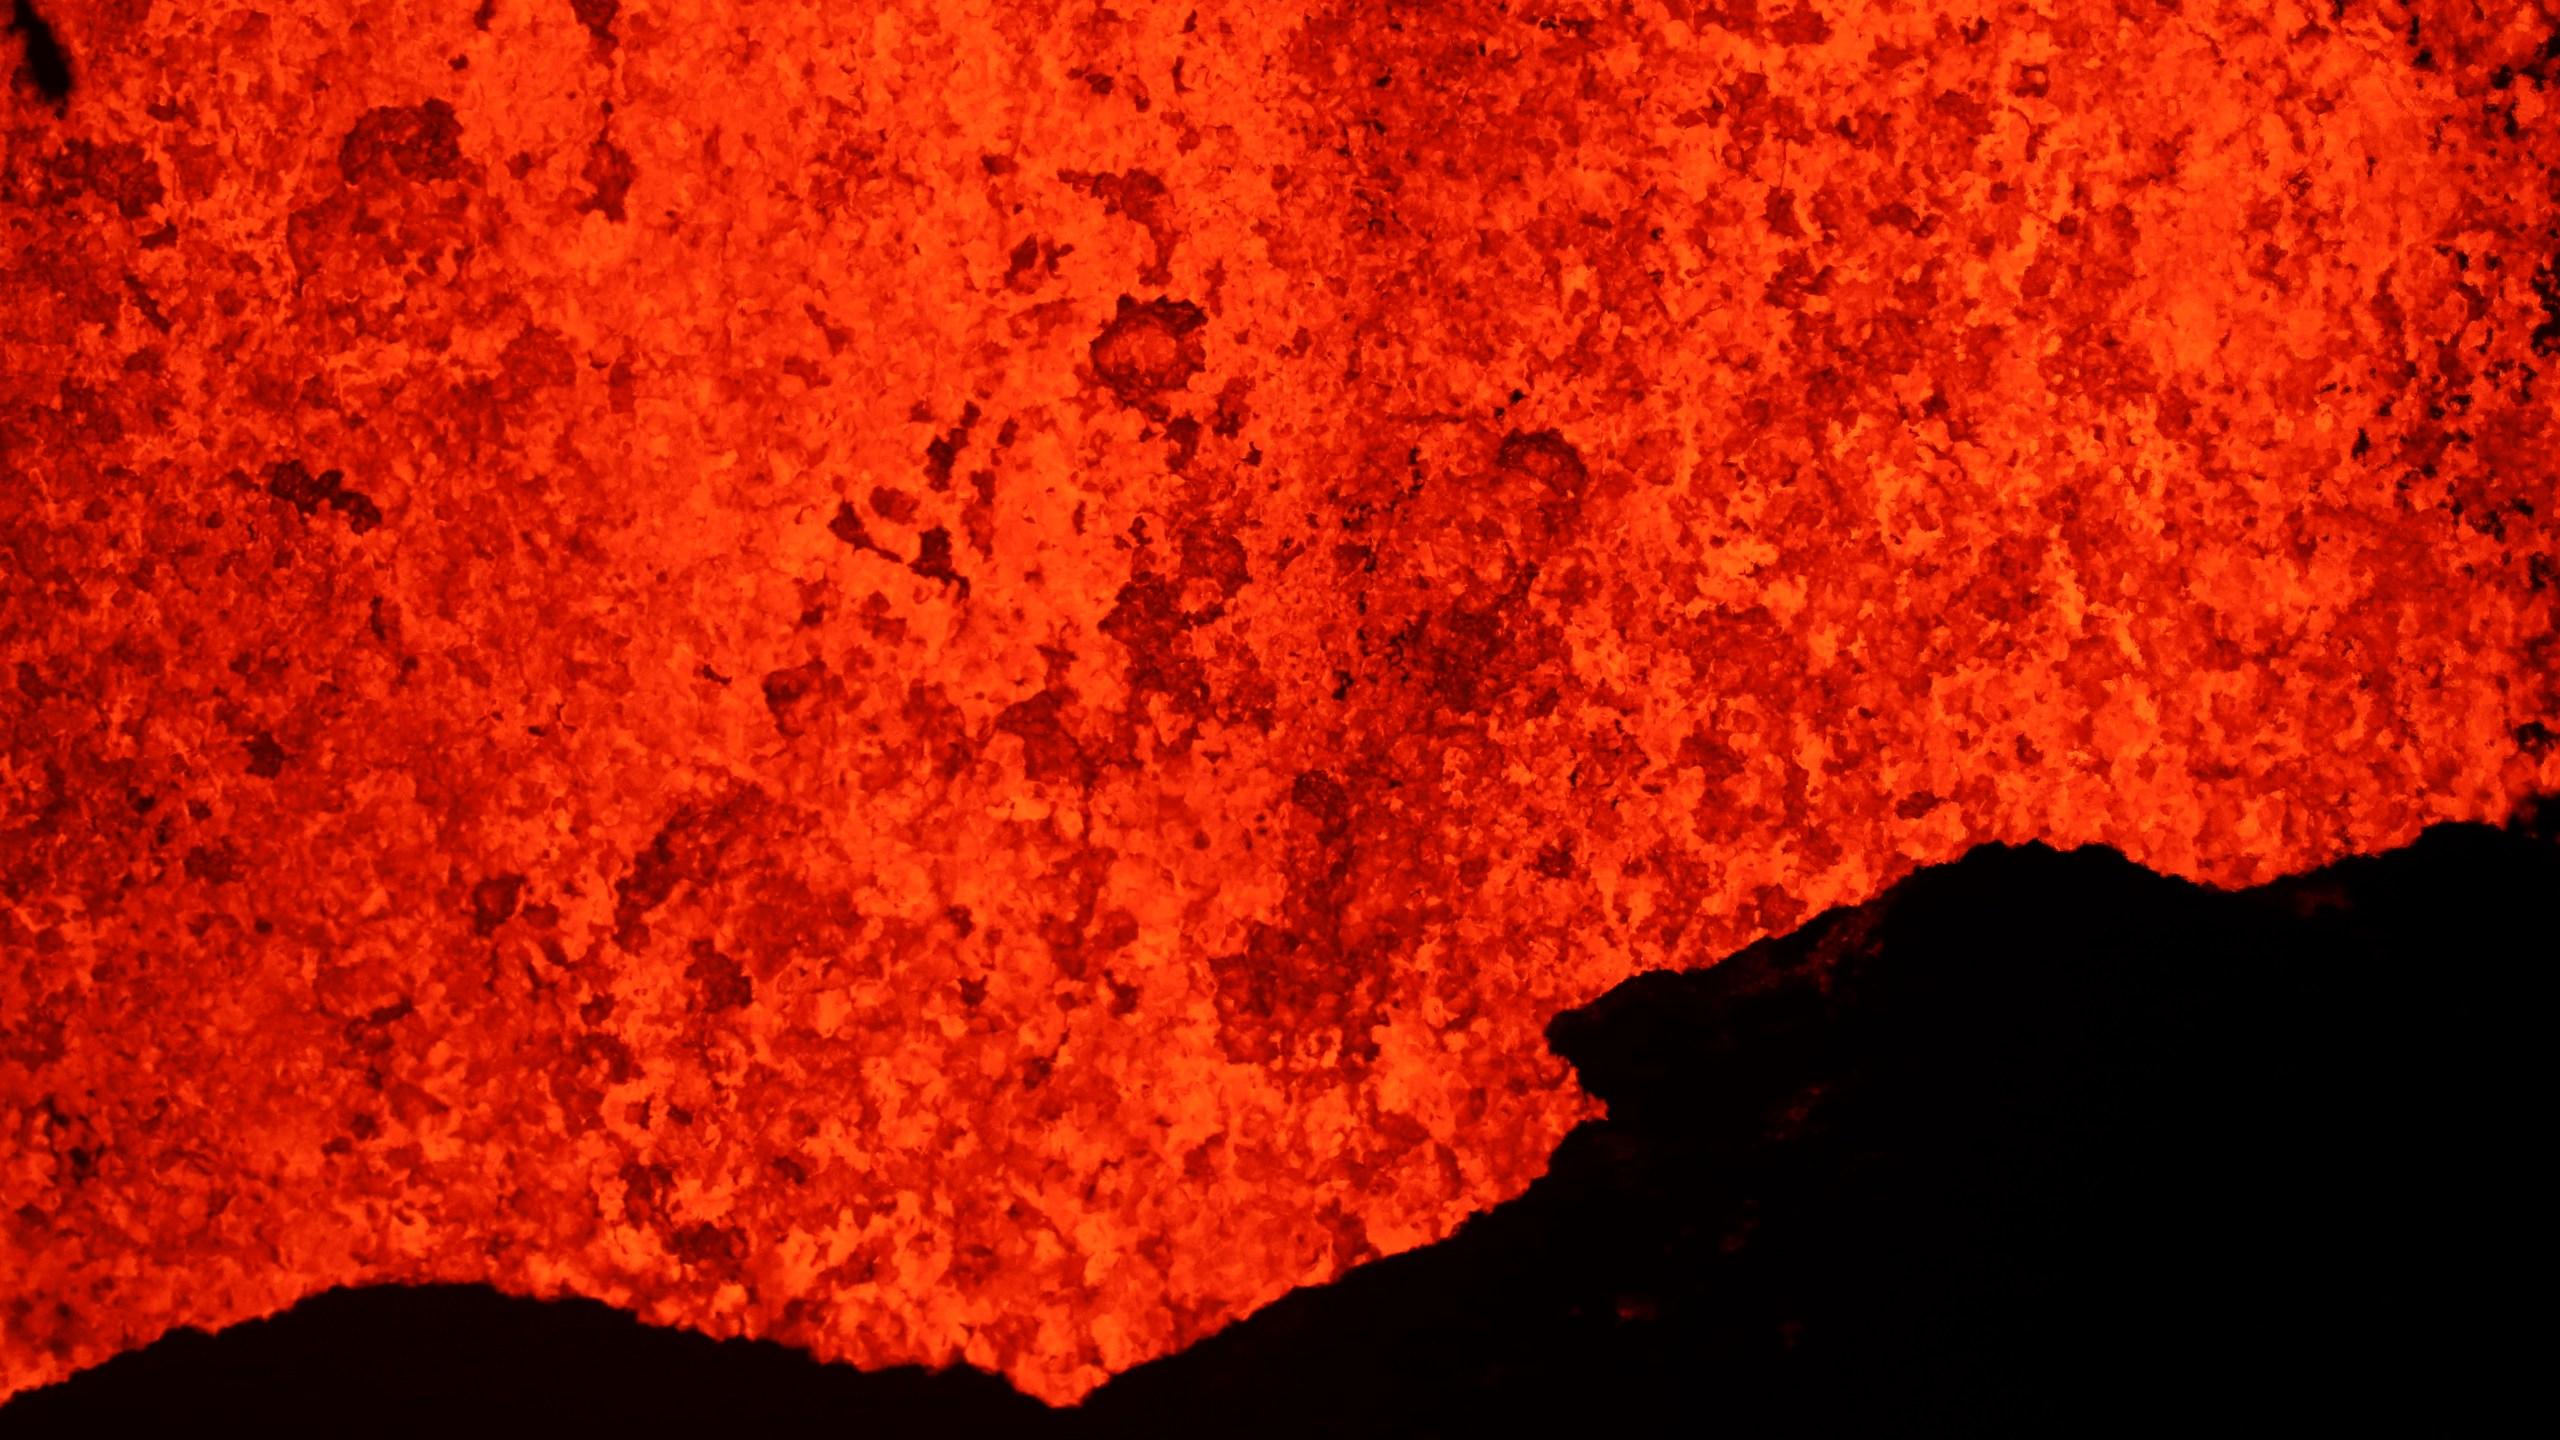 Hawaii Volcano Producing Toxic Lava Haze Plume Called Laze